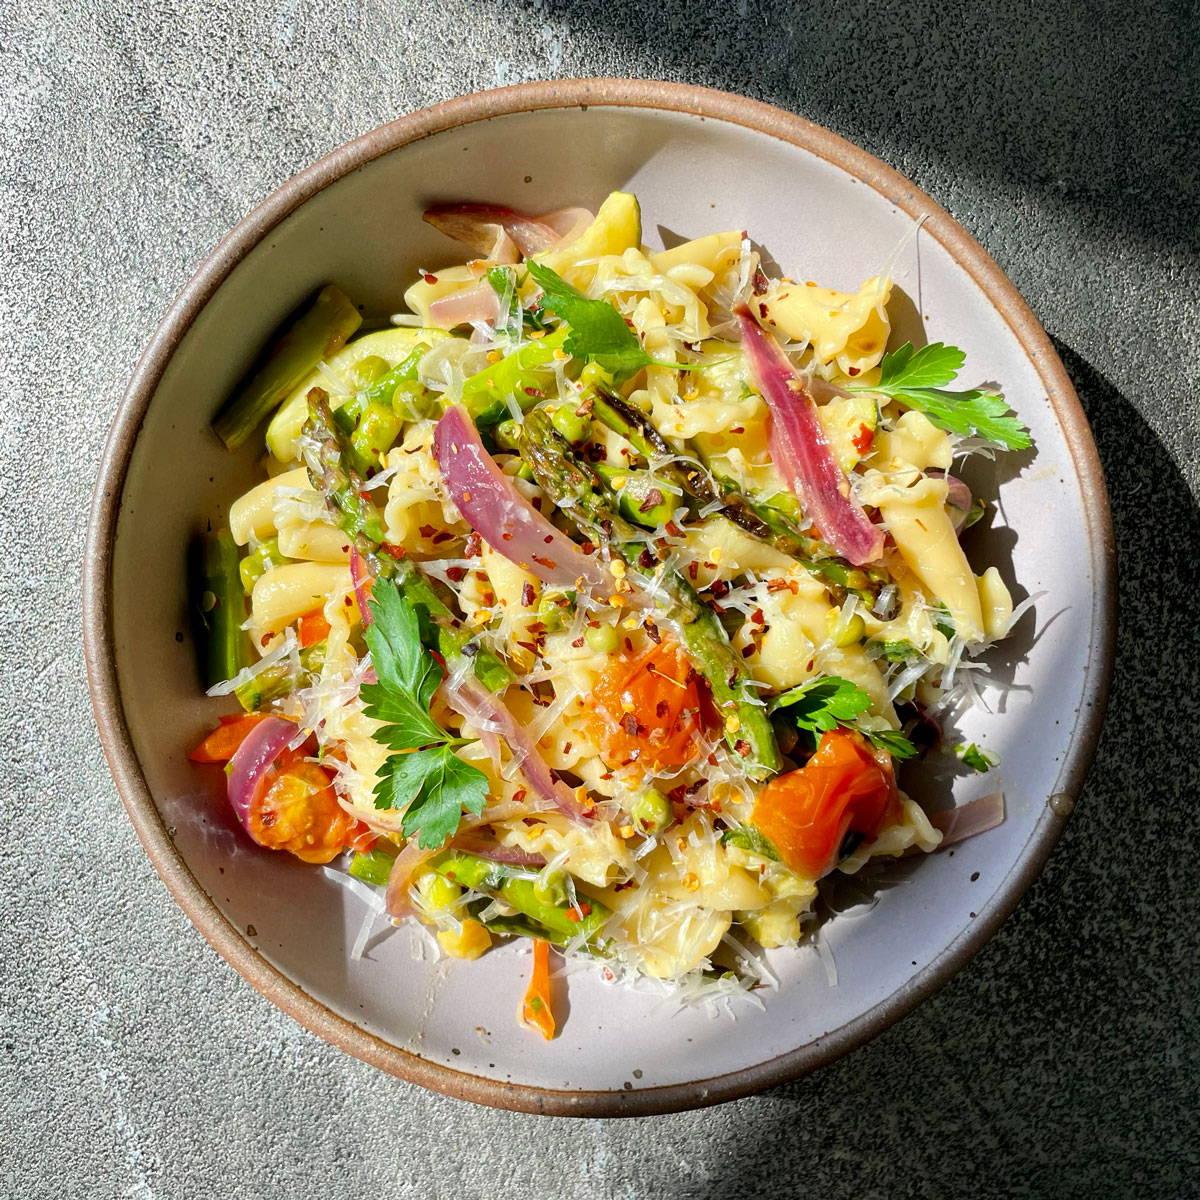 Zaynab Issa's Pasta Primavera recipe for East Fork